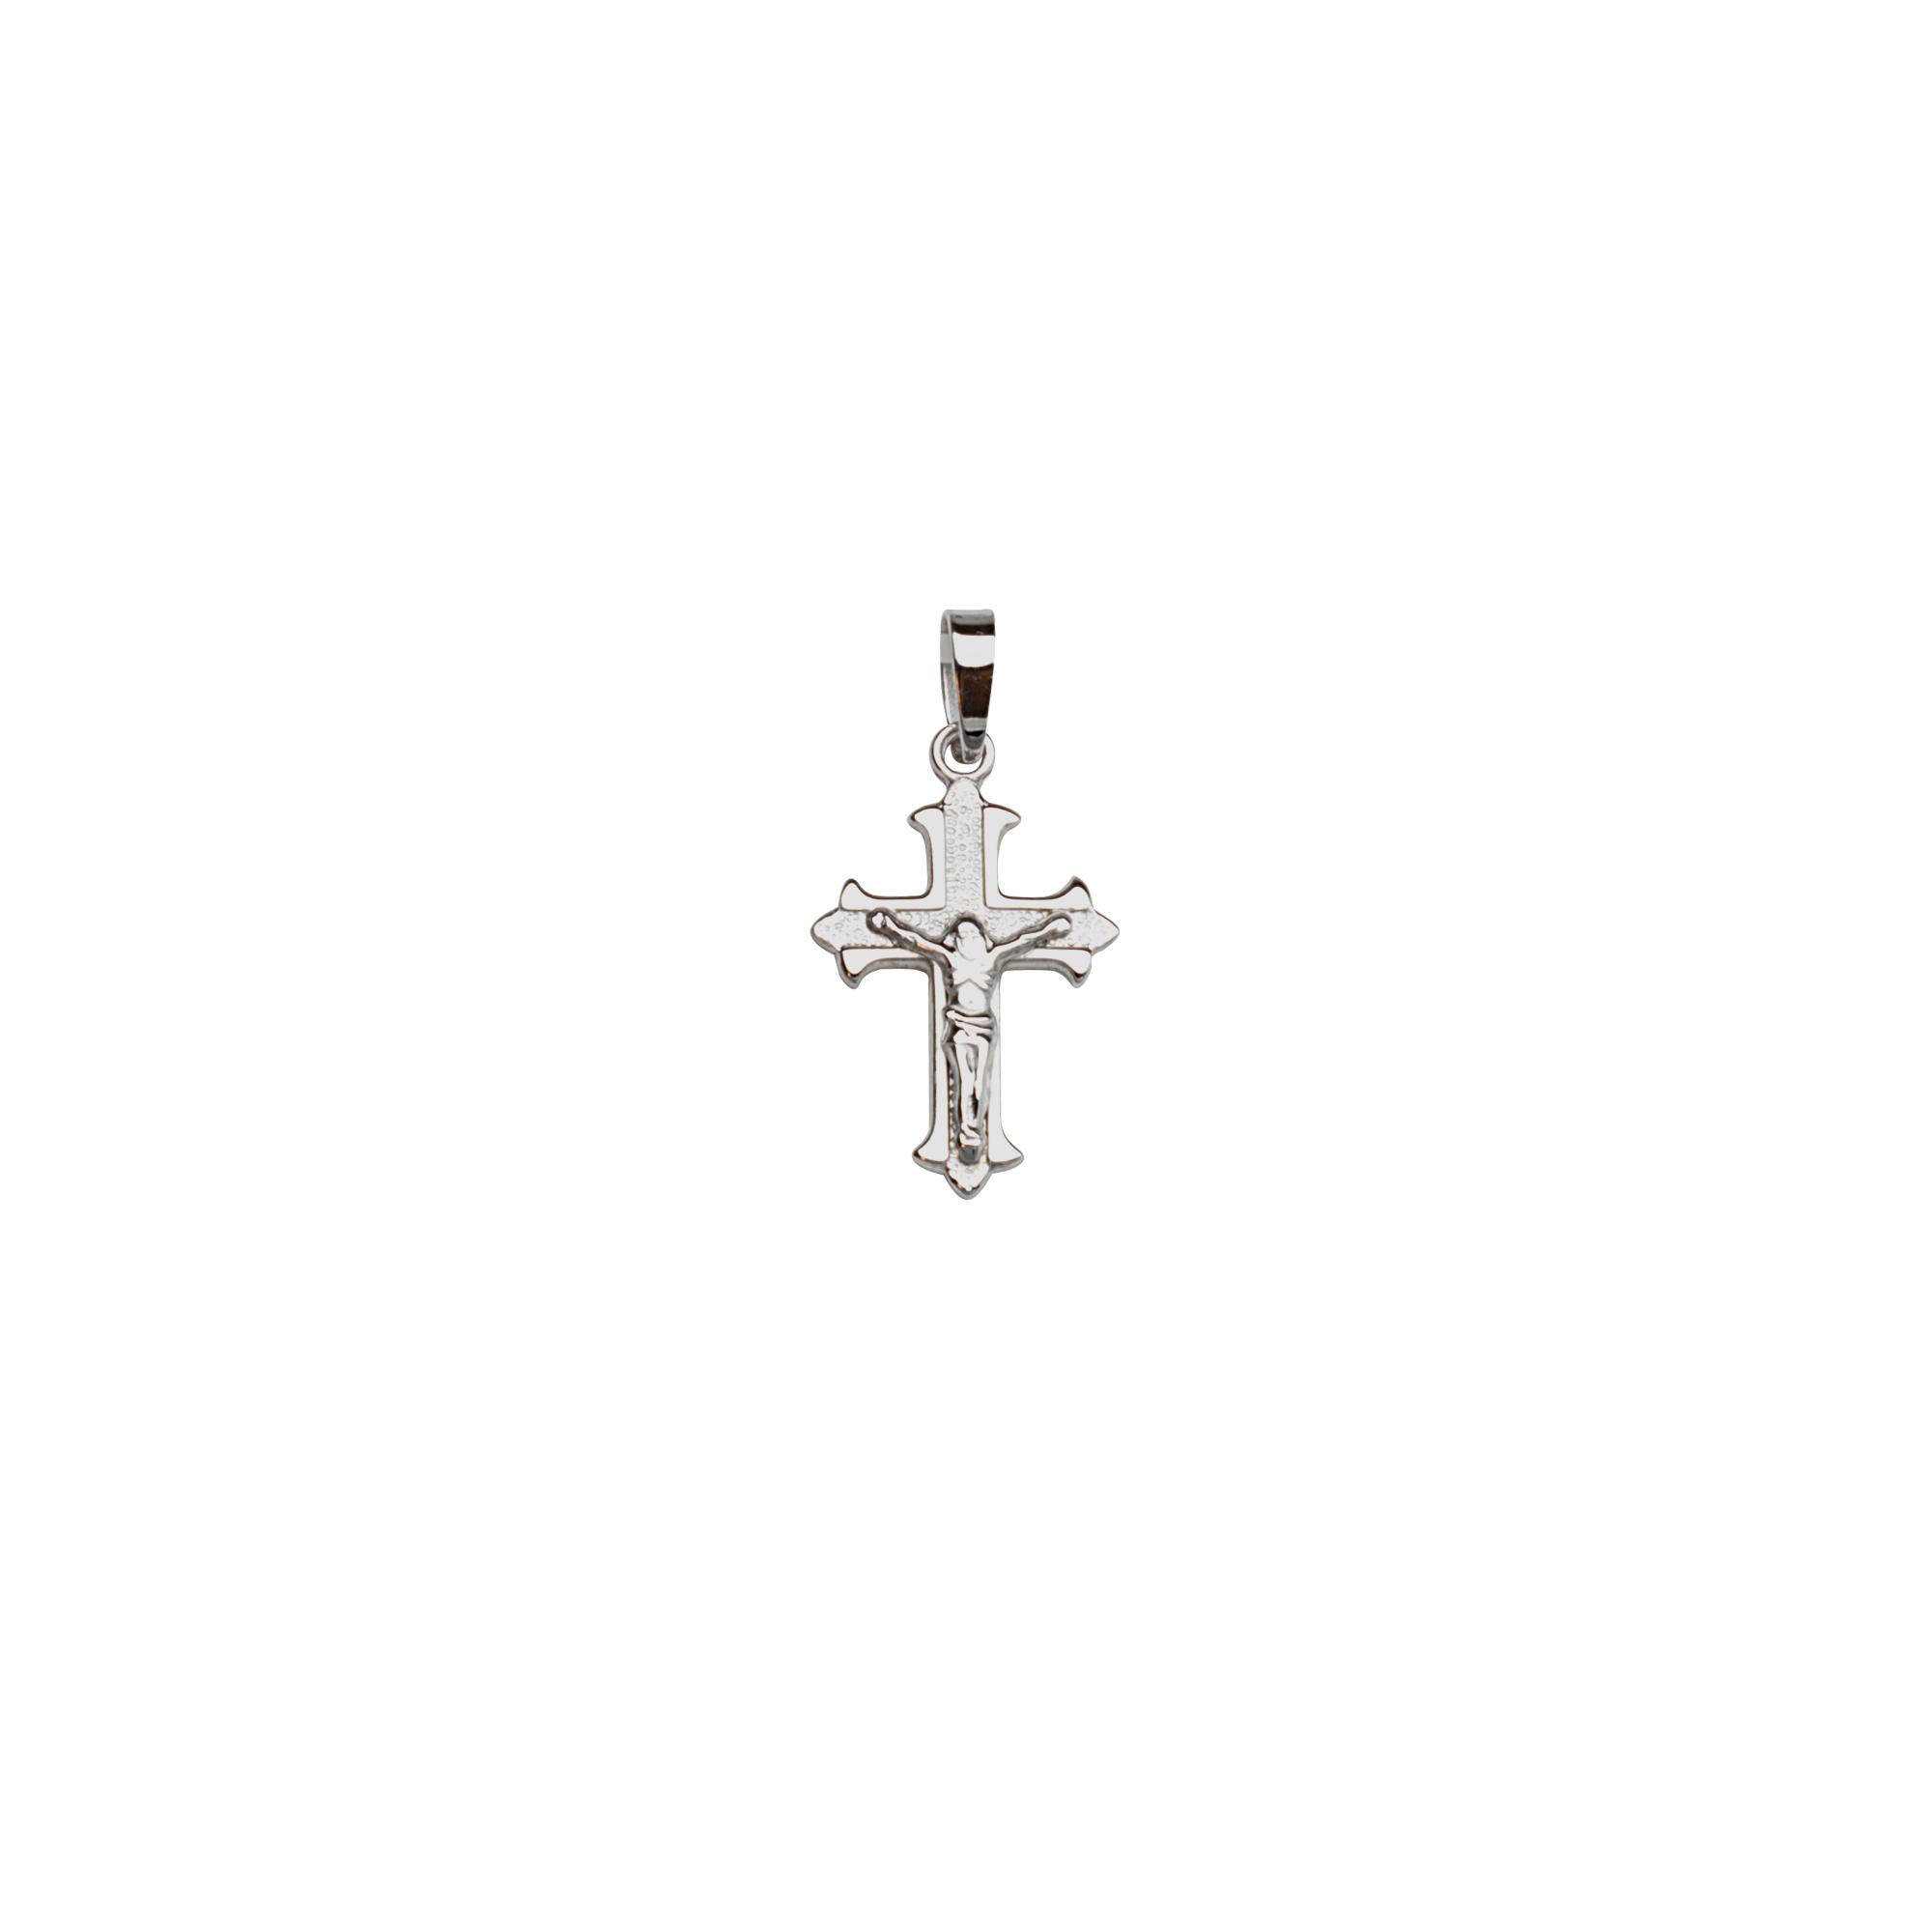 Silver Pendant, Ss Rh Plated Crucifix Pendant